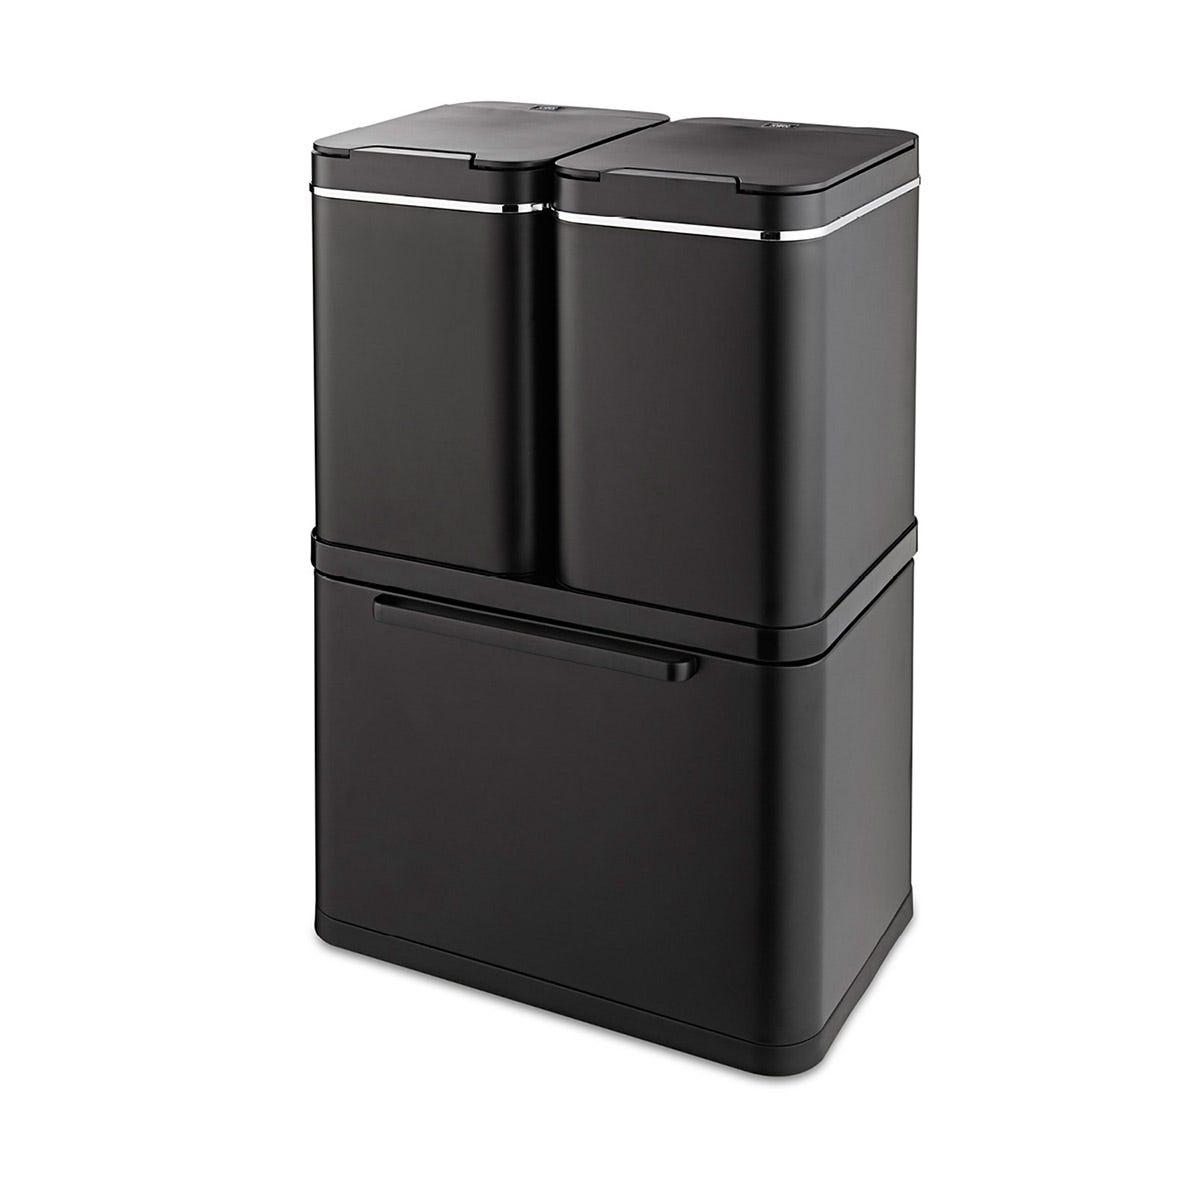 Tower 100L Stacked Sensor Recycling Bin - Black